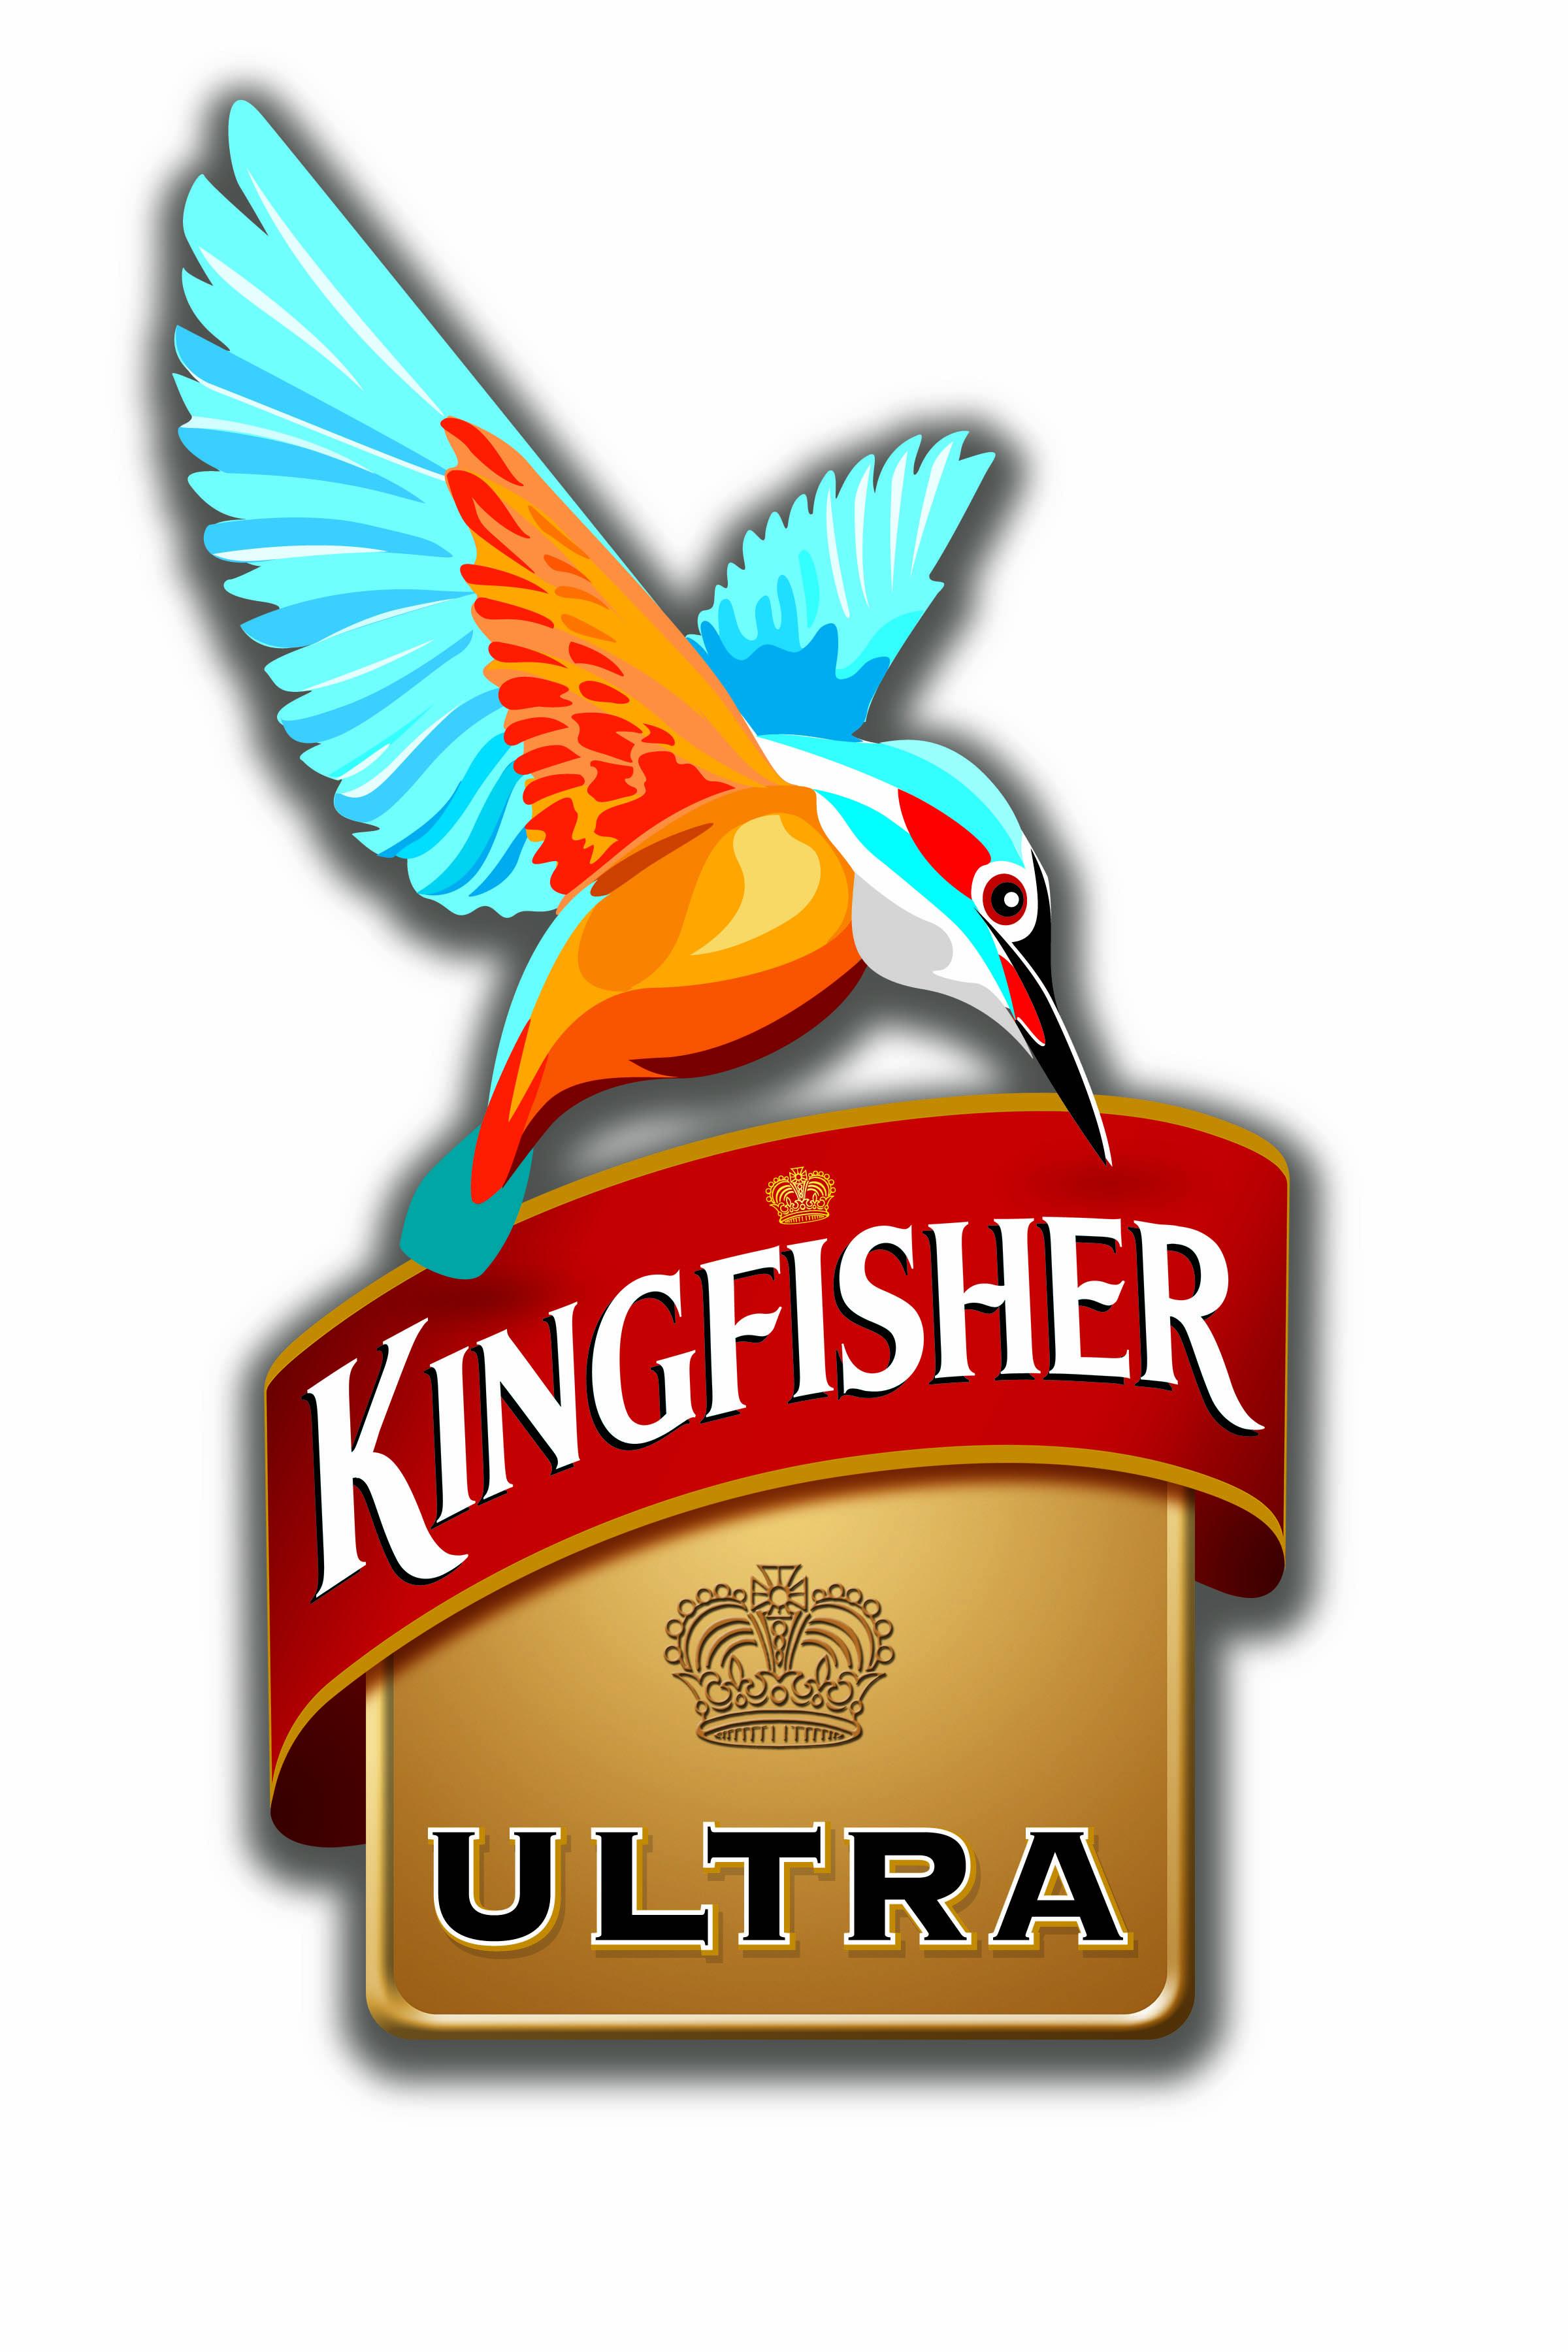 Kingfisher Ultra Logos